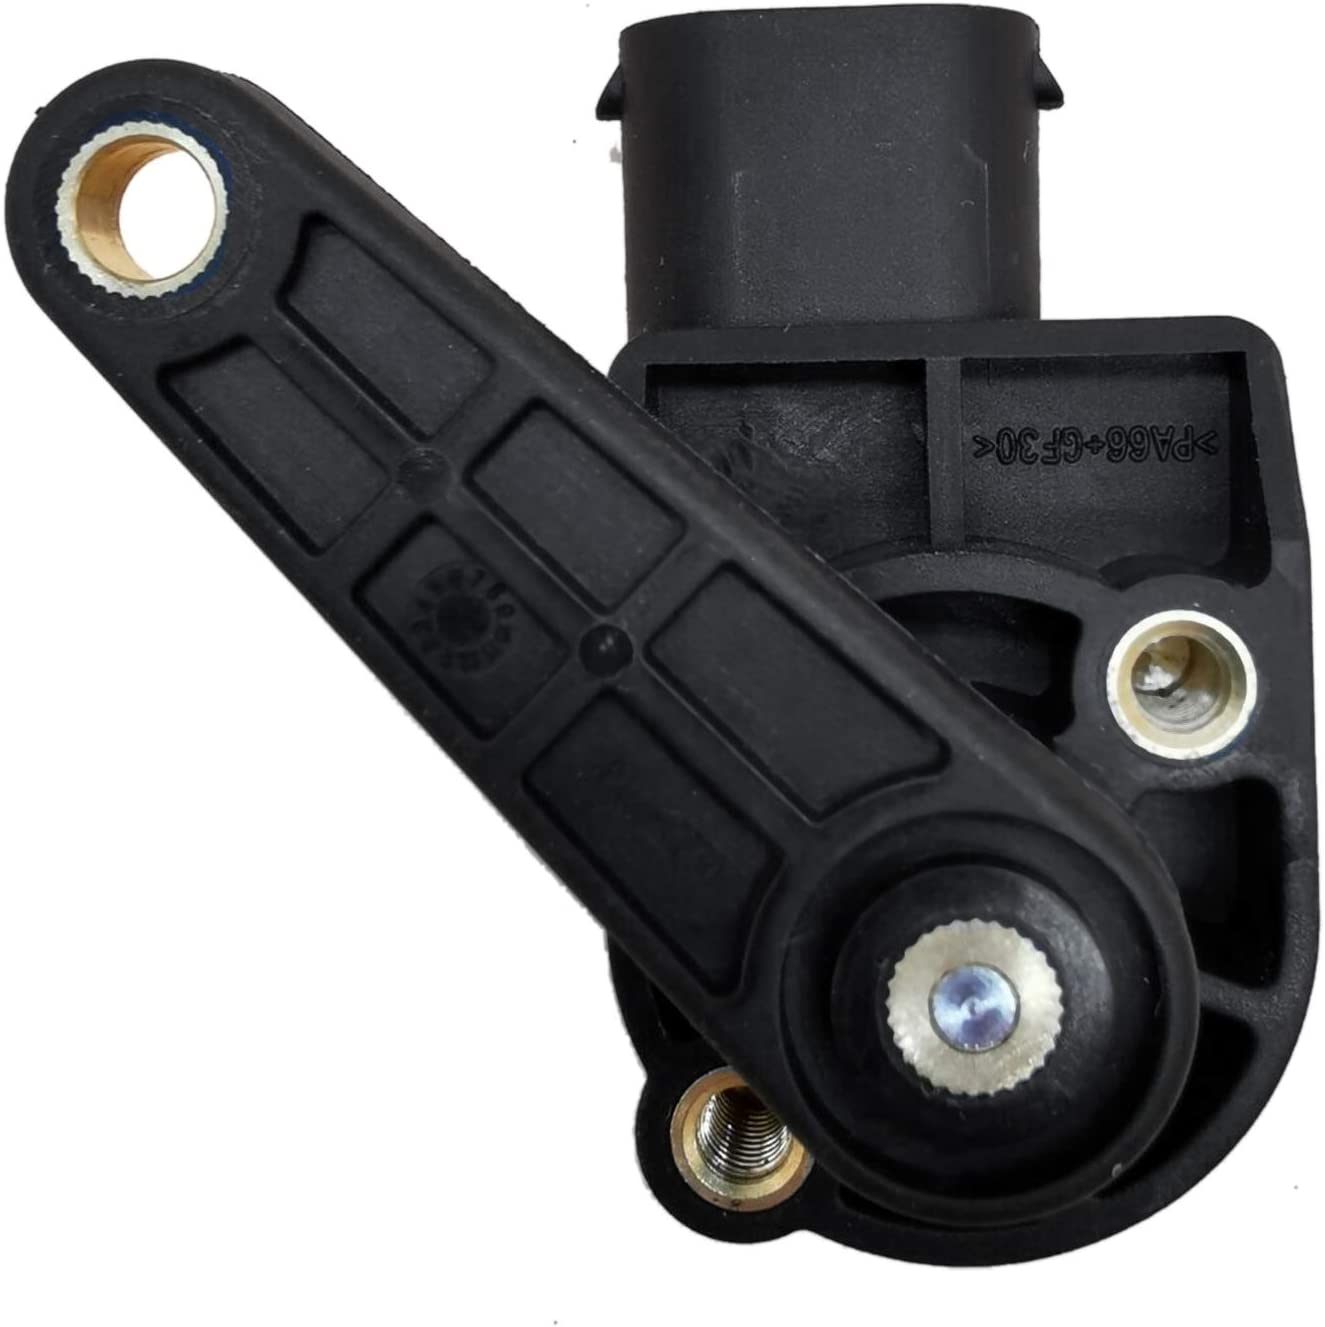 7L0616571 8E0907503 3D0941286C Fltaheroo Auto Scheinwerfer Level Sensor K?Rper H?Hen Sensor f/ür for